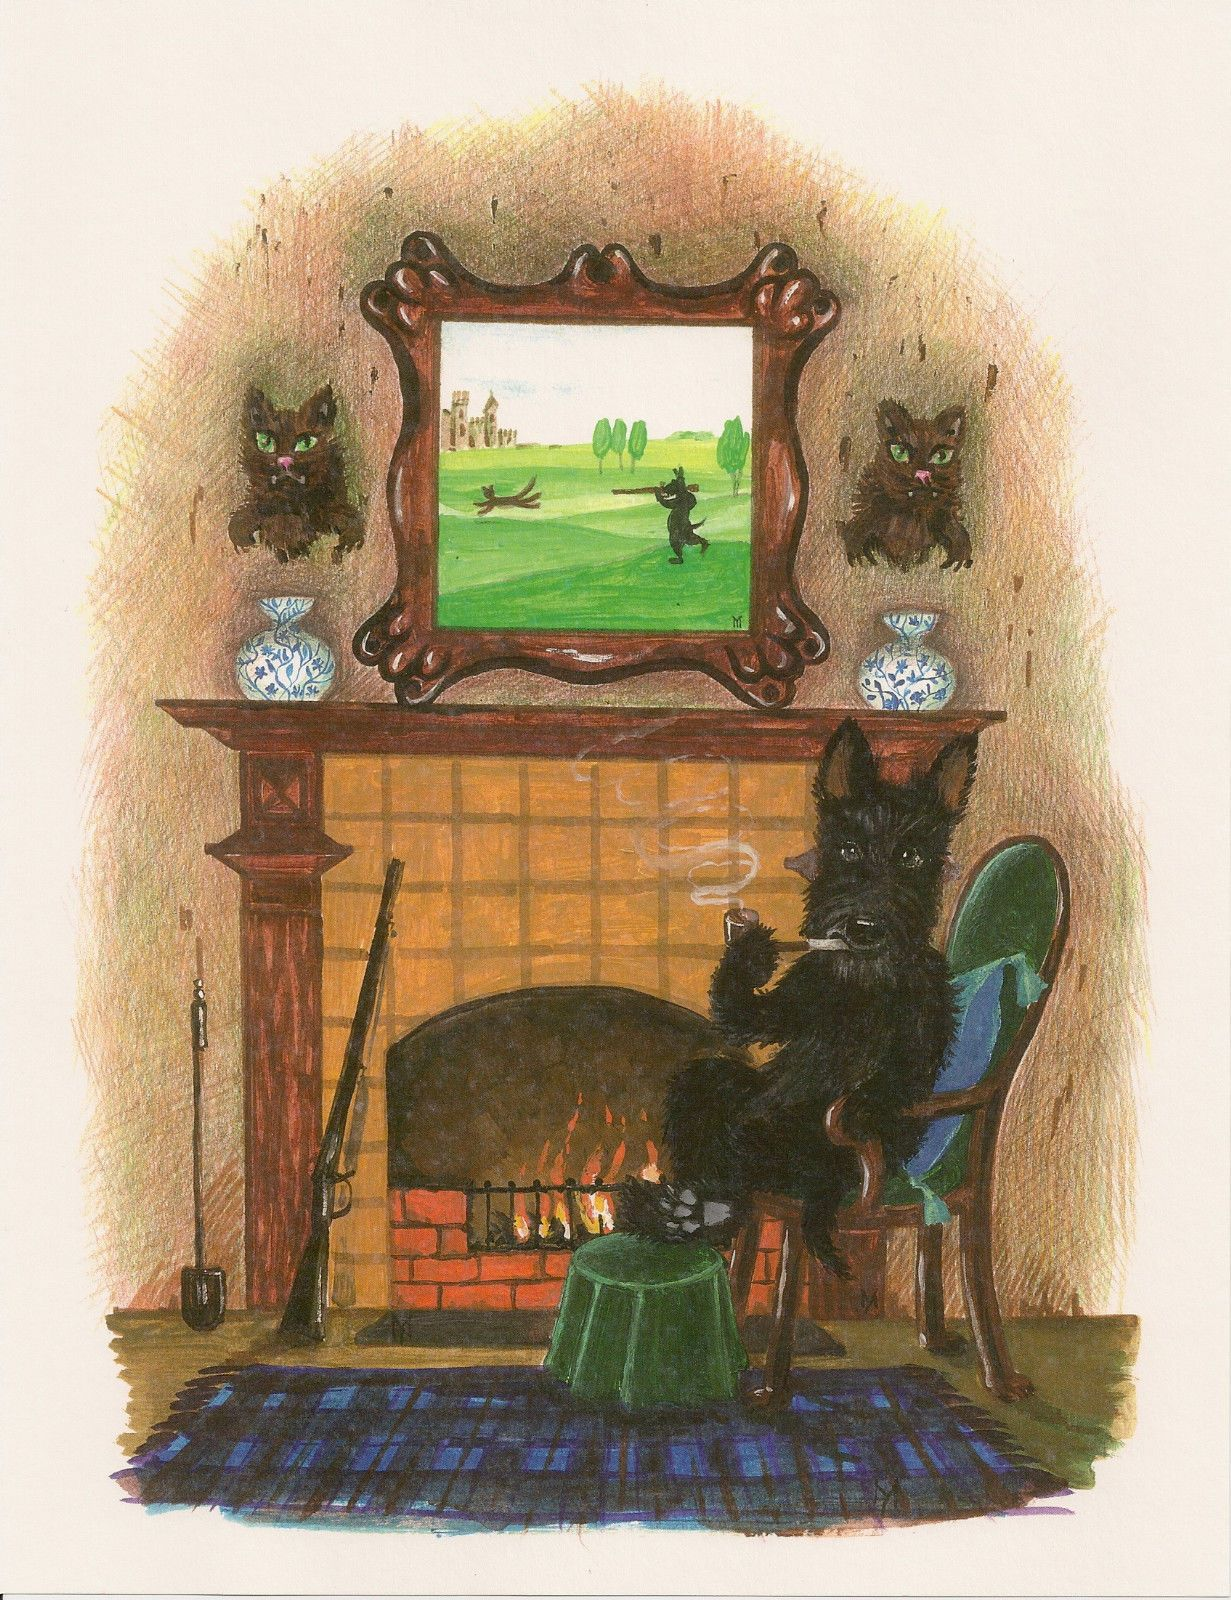 4x6 PRINT OF PAINTING CAIRN TERRIER FOLK ART RAINBOW BRIDGE RYTA DOG WILDLIFE